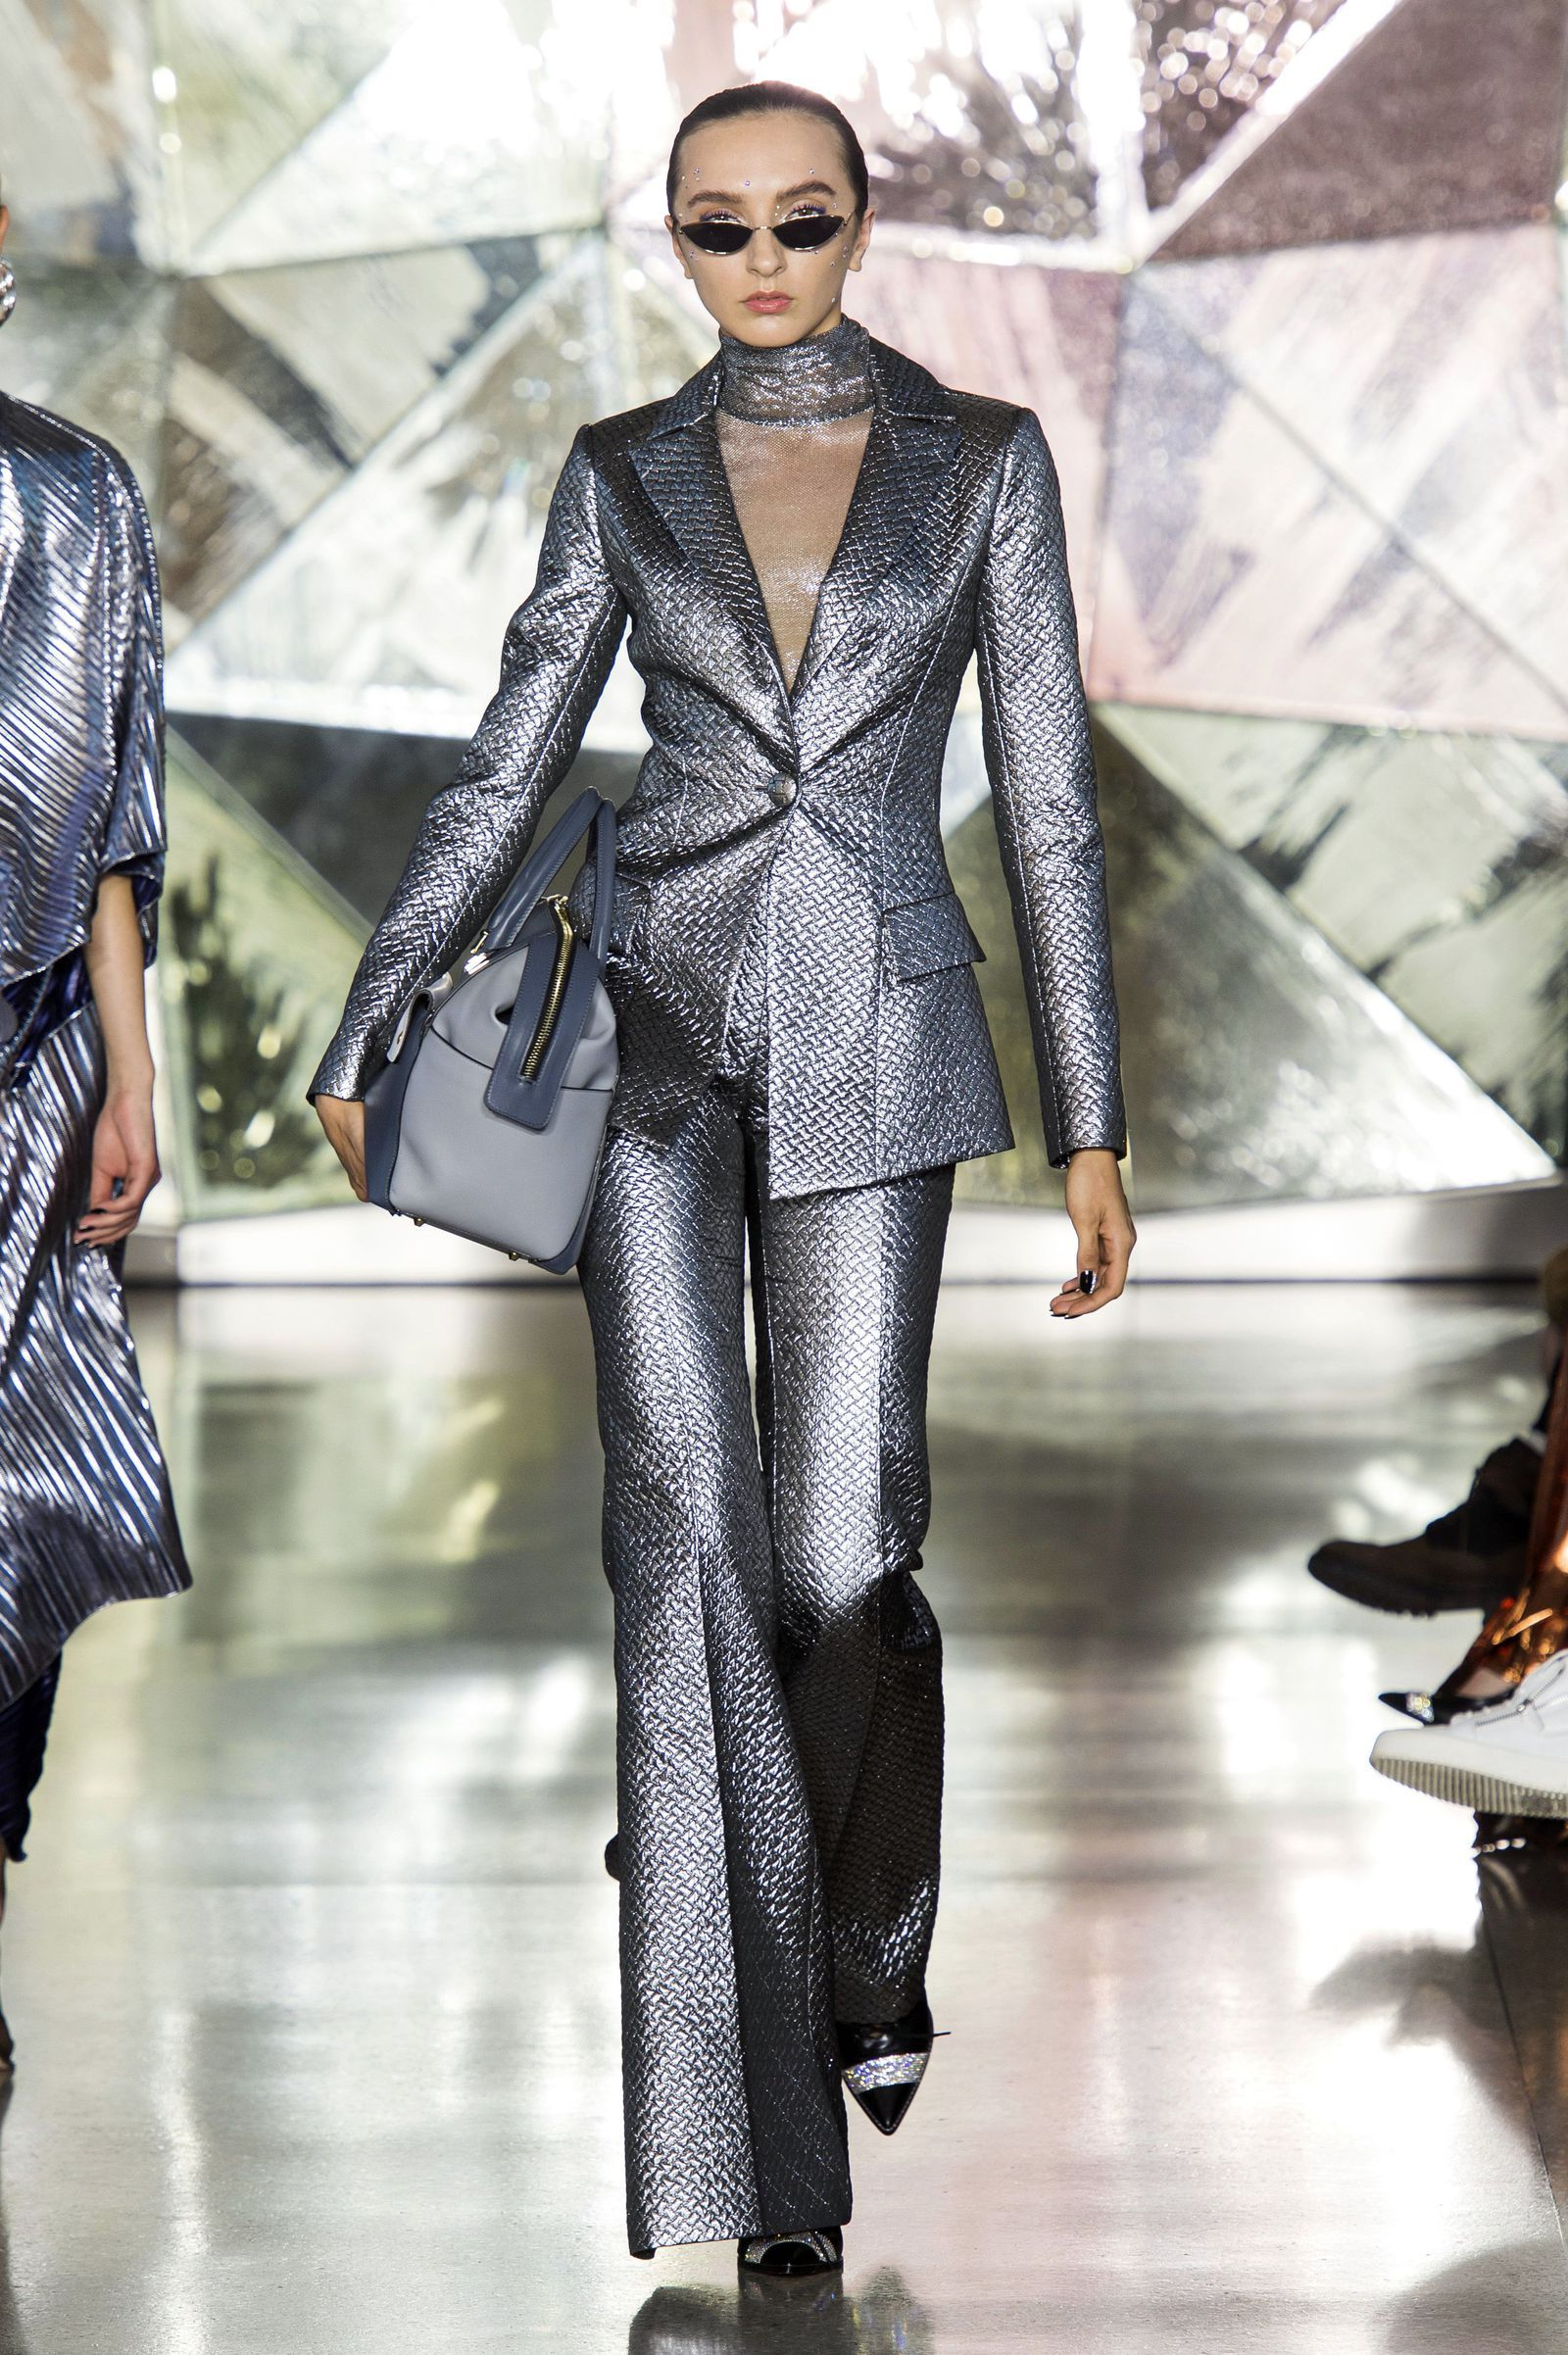 Abiti La tendenza dei nuovi pantaloni Moda 2019